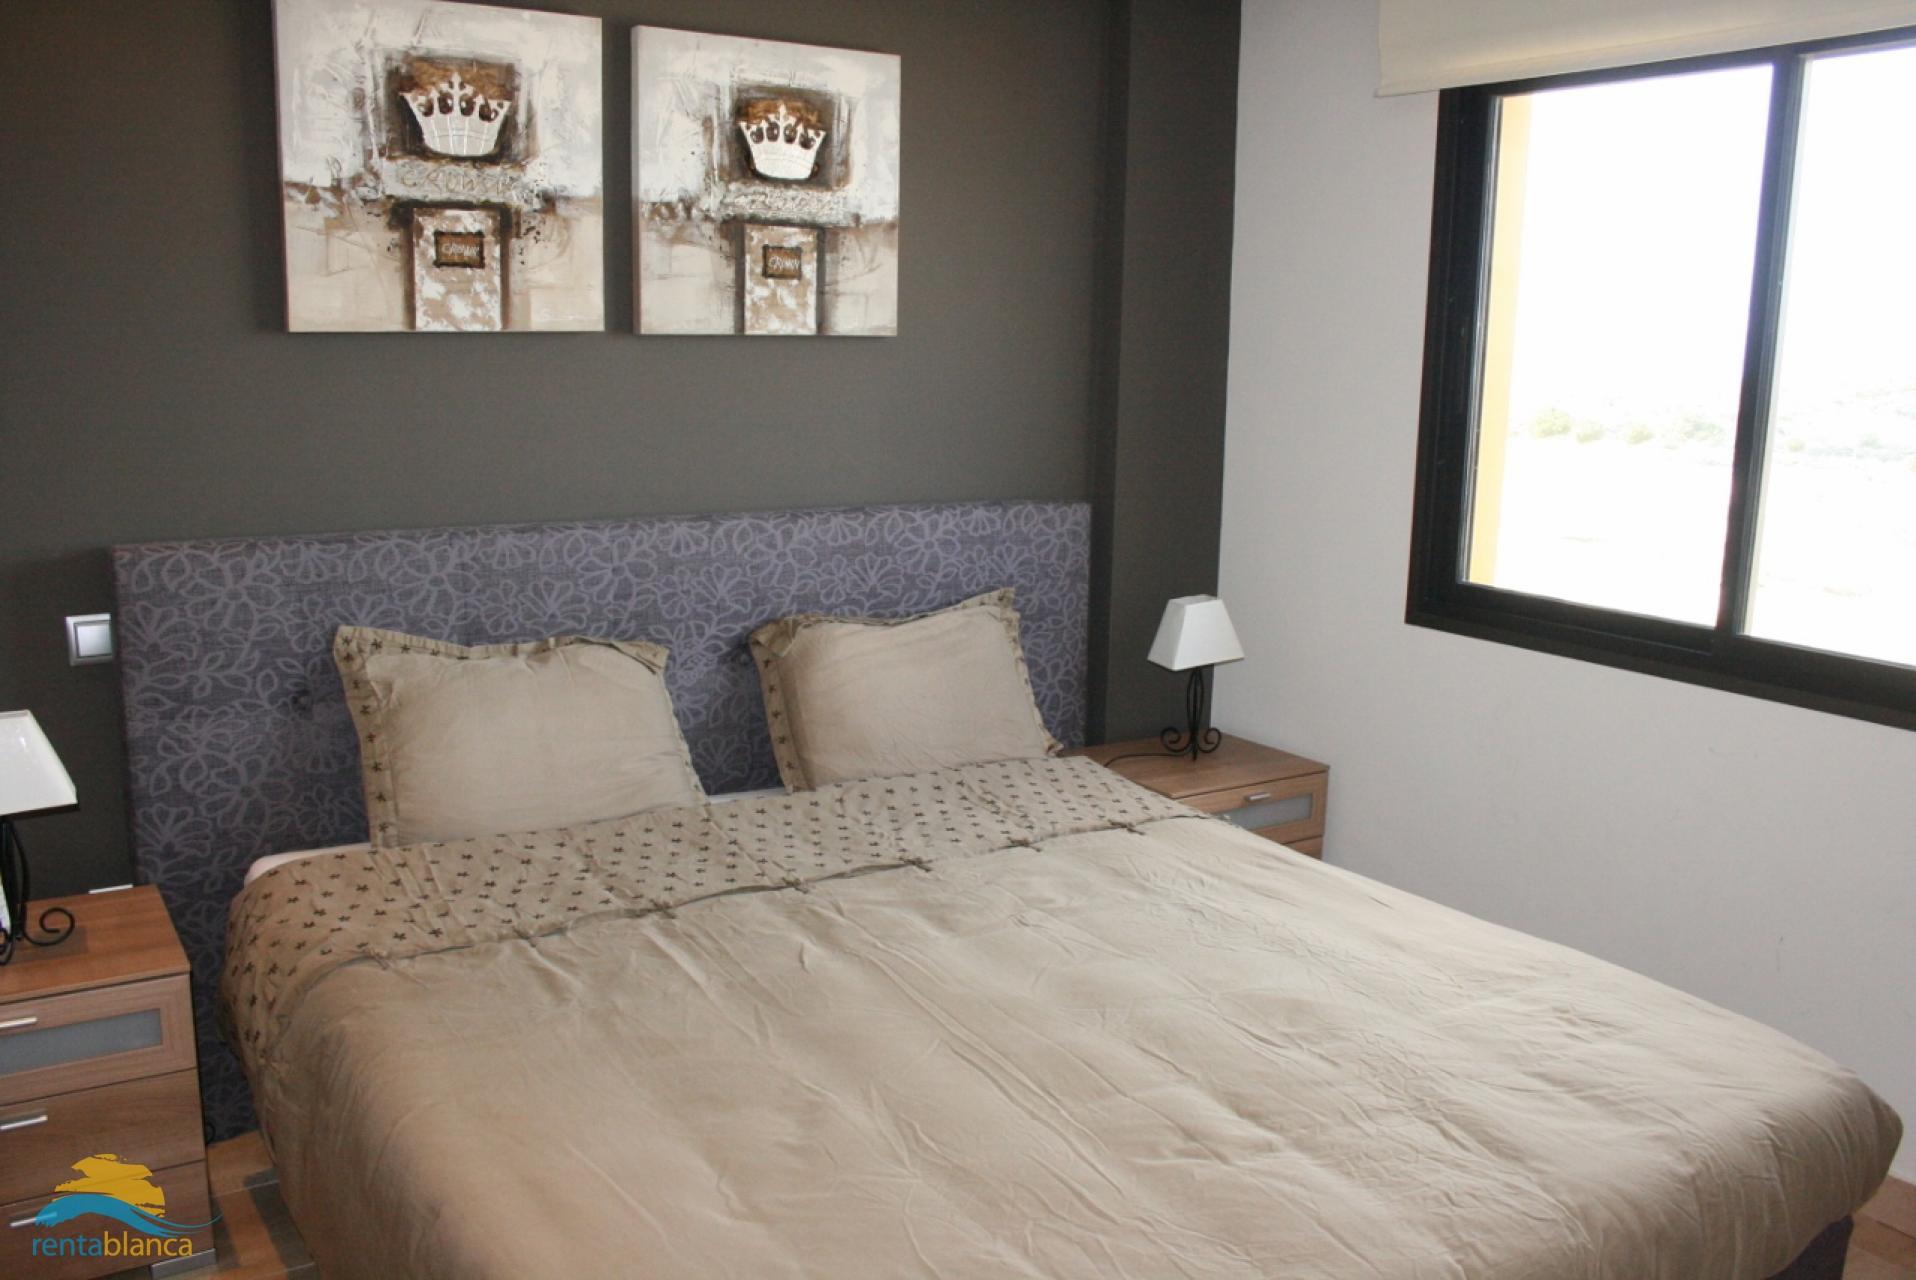 Apartment Marjal Beach - Guardamar - Rentablanca